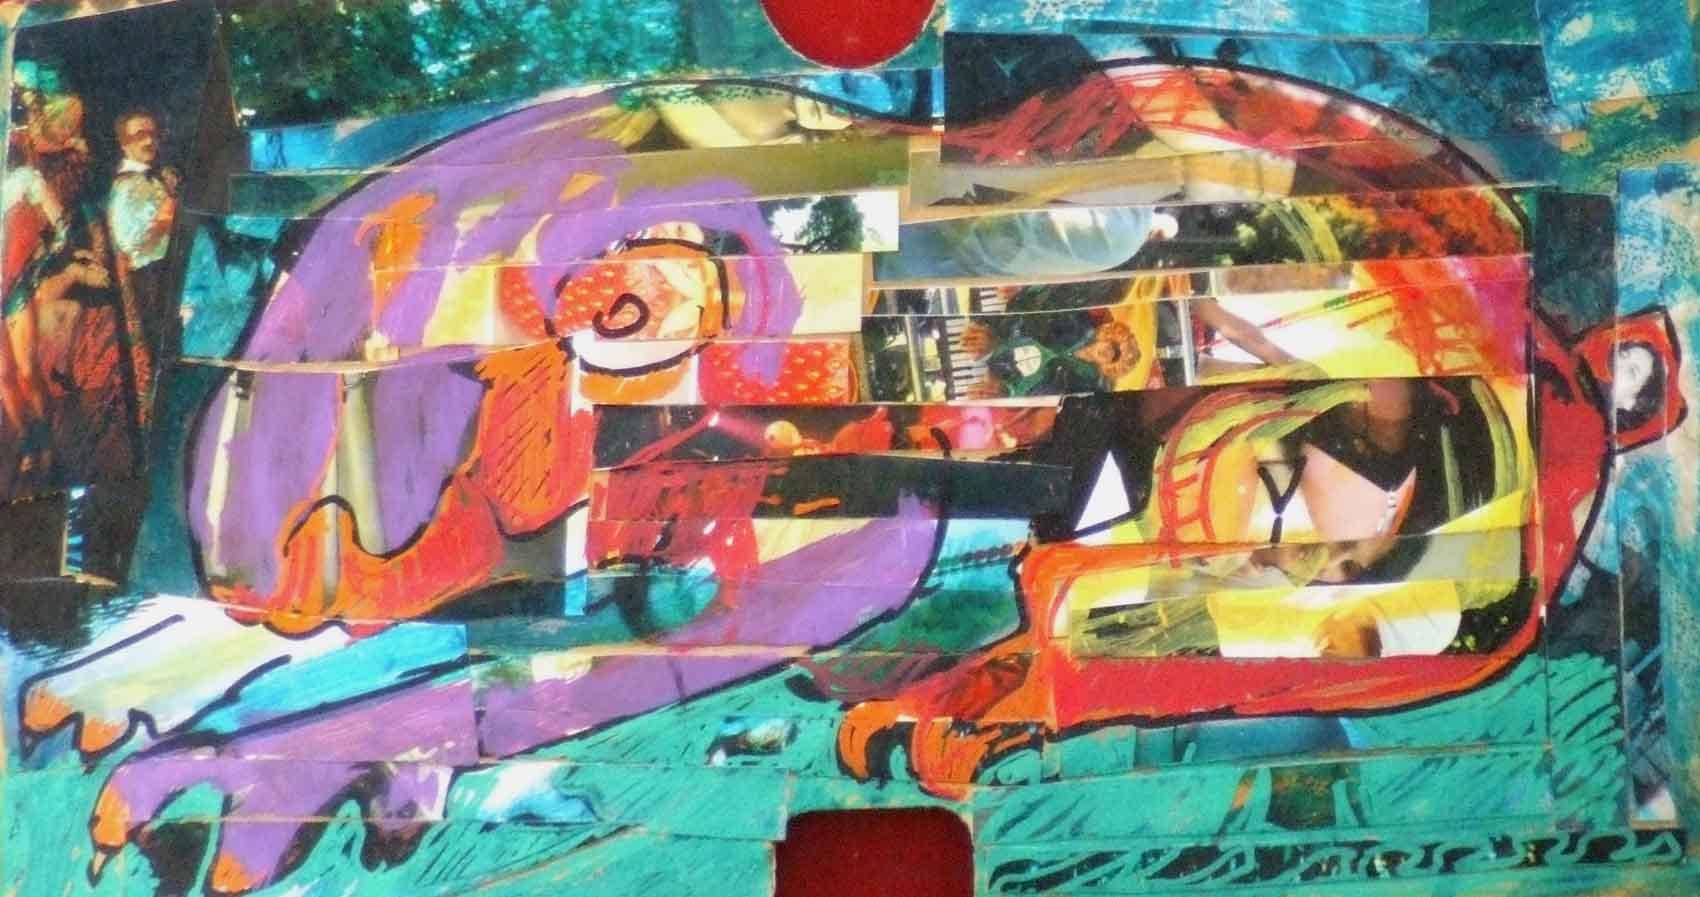 Taupe © David Noir | Dessins, peintures, collages